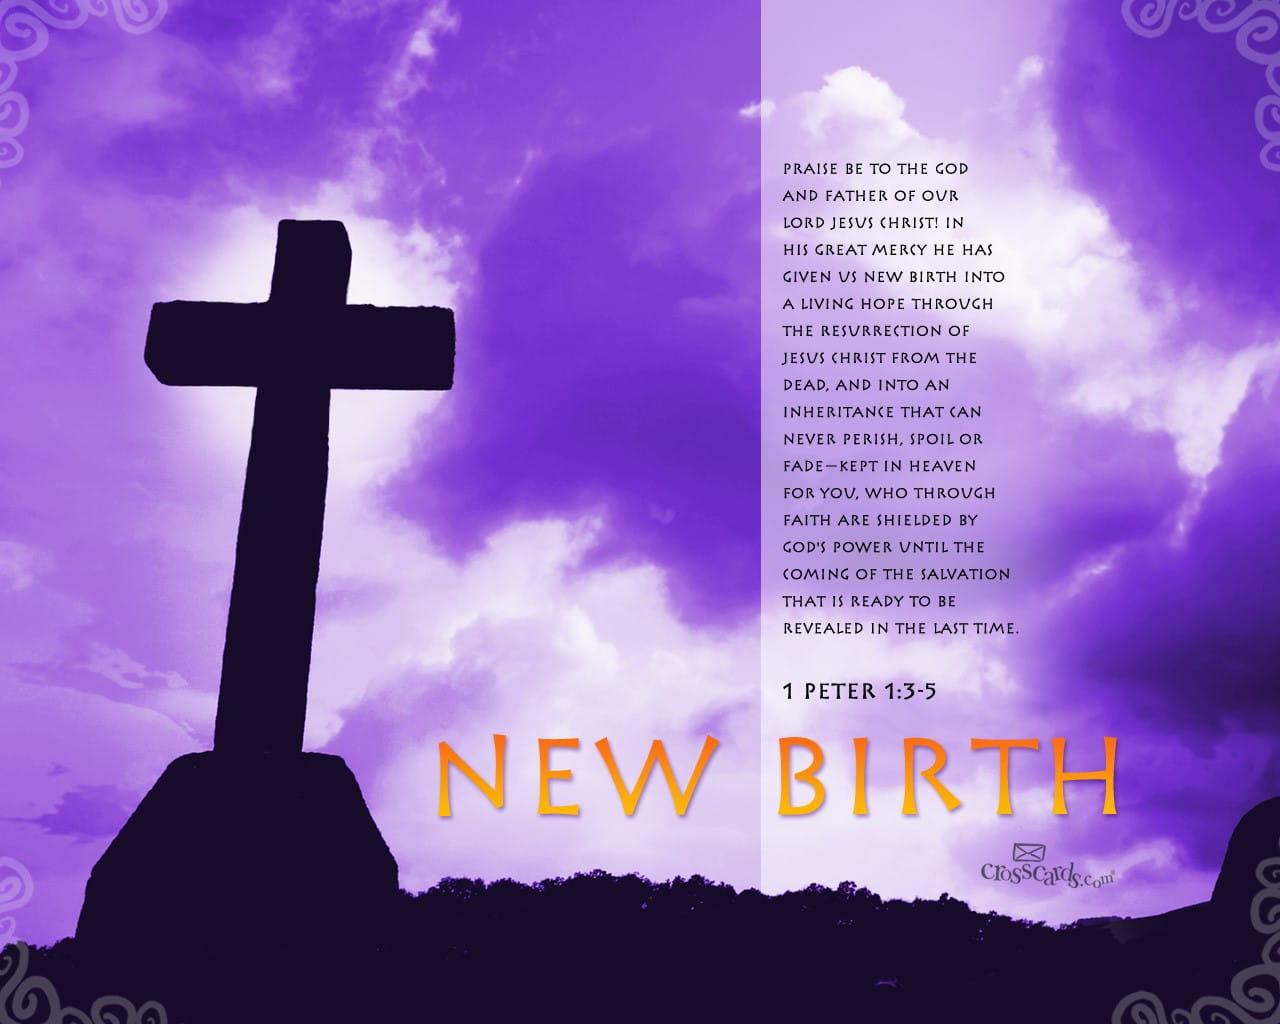 Fall Scripture Wallpaper New Birth 1 Peter 1 3 5 Bible Verses And Scripture